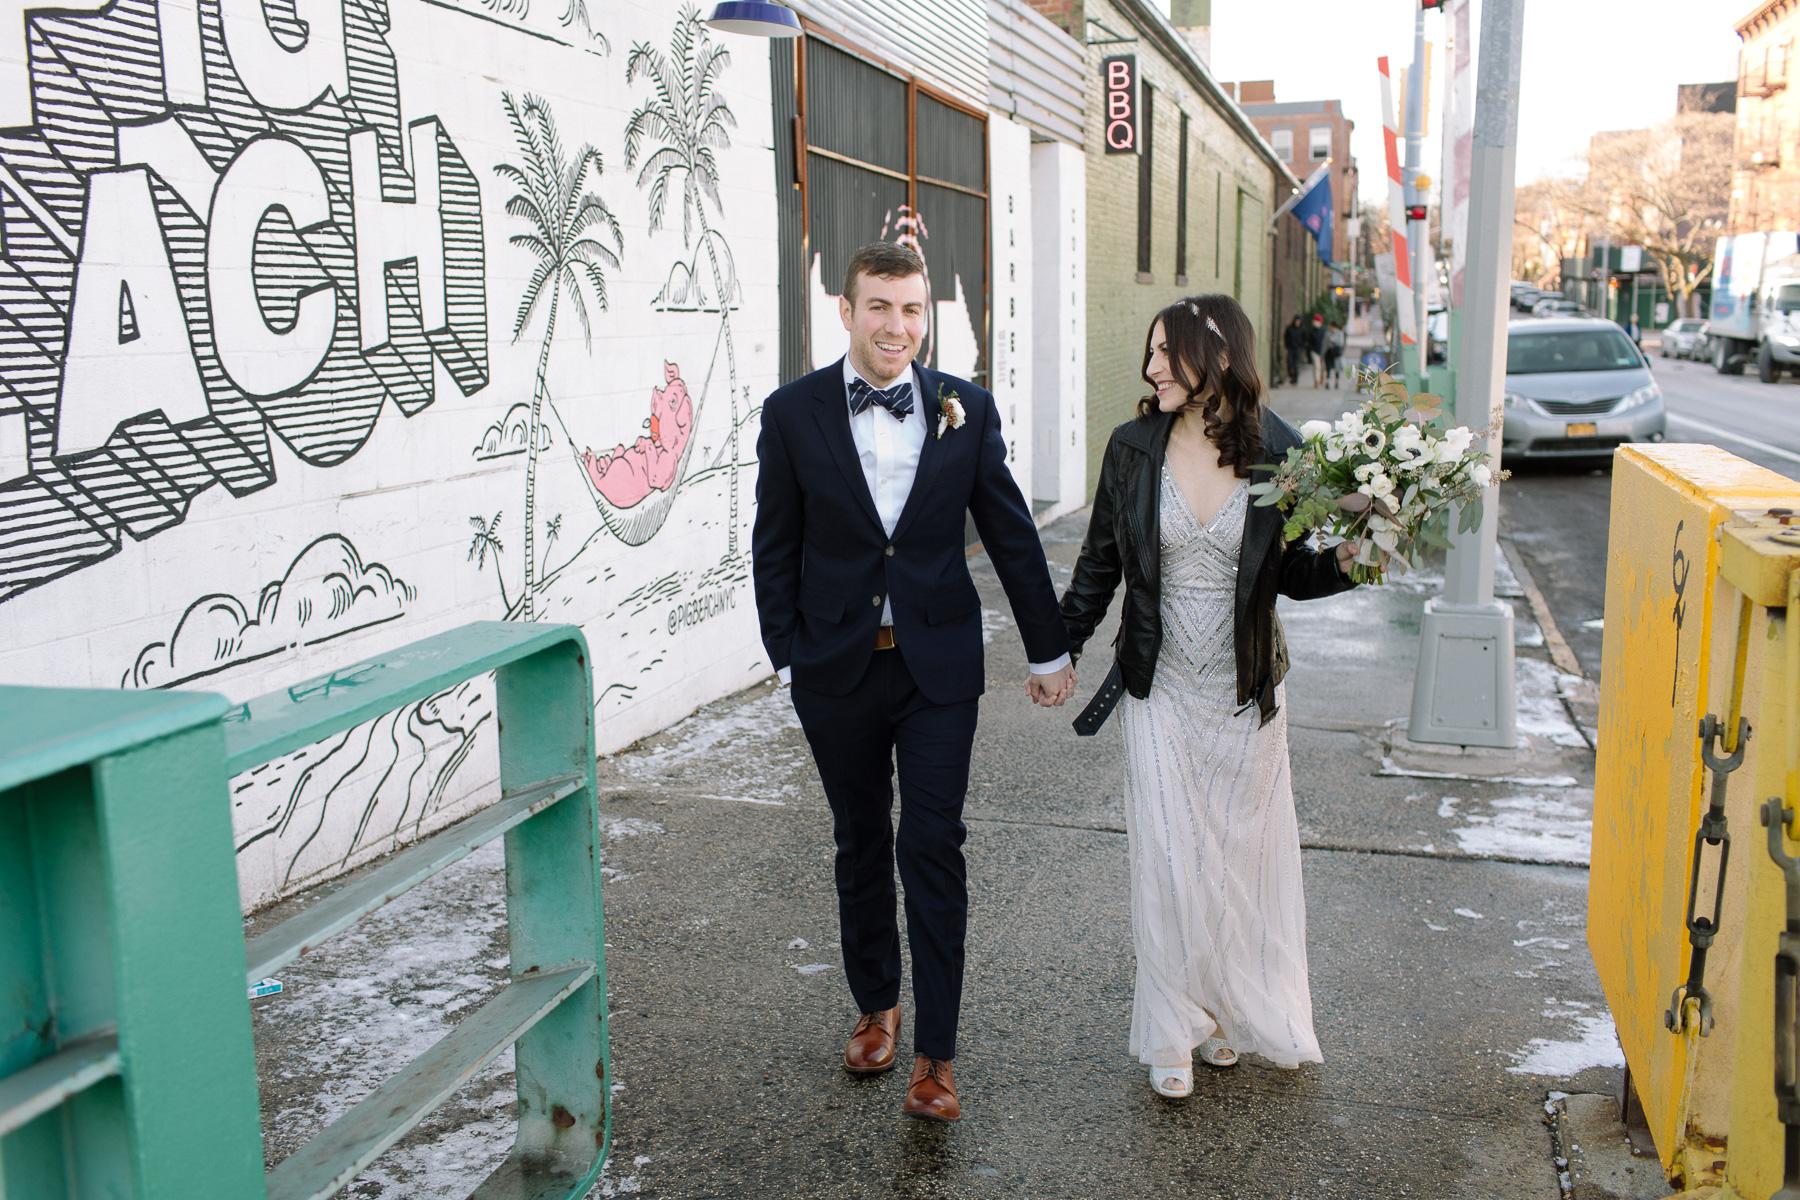 green building wedding photographer brooklyn mod cloth wedding dress feminist jewish wedding